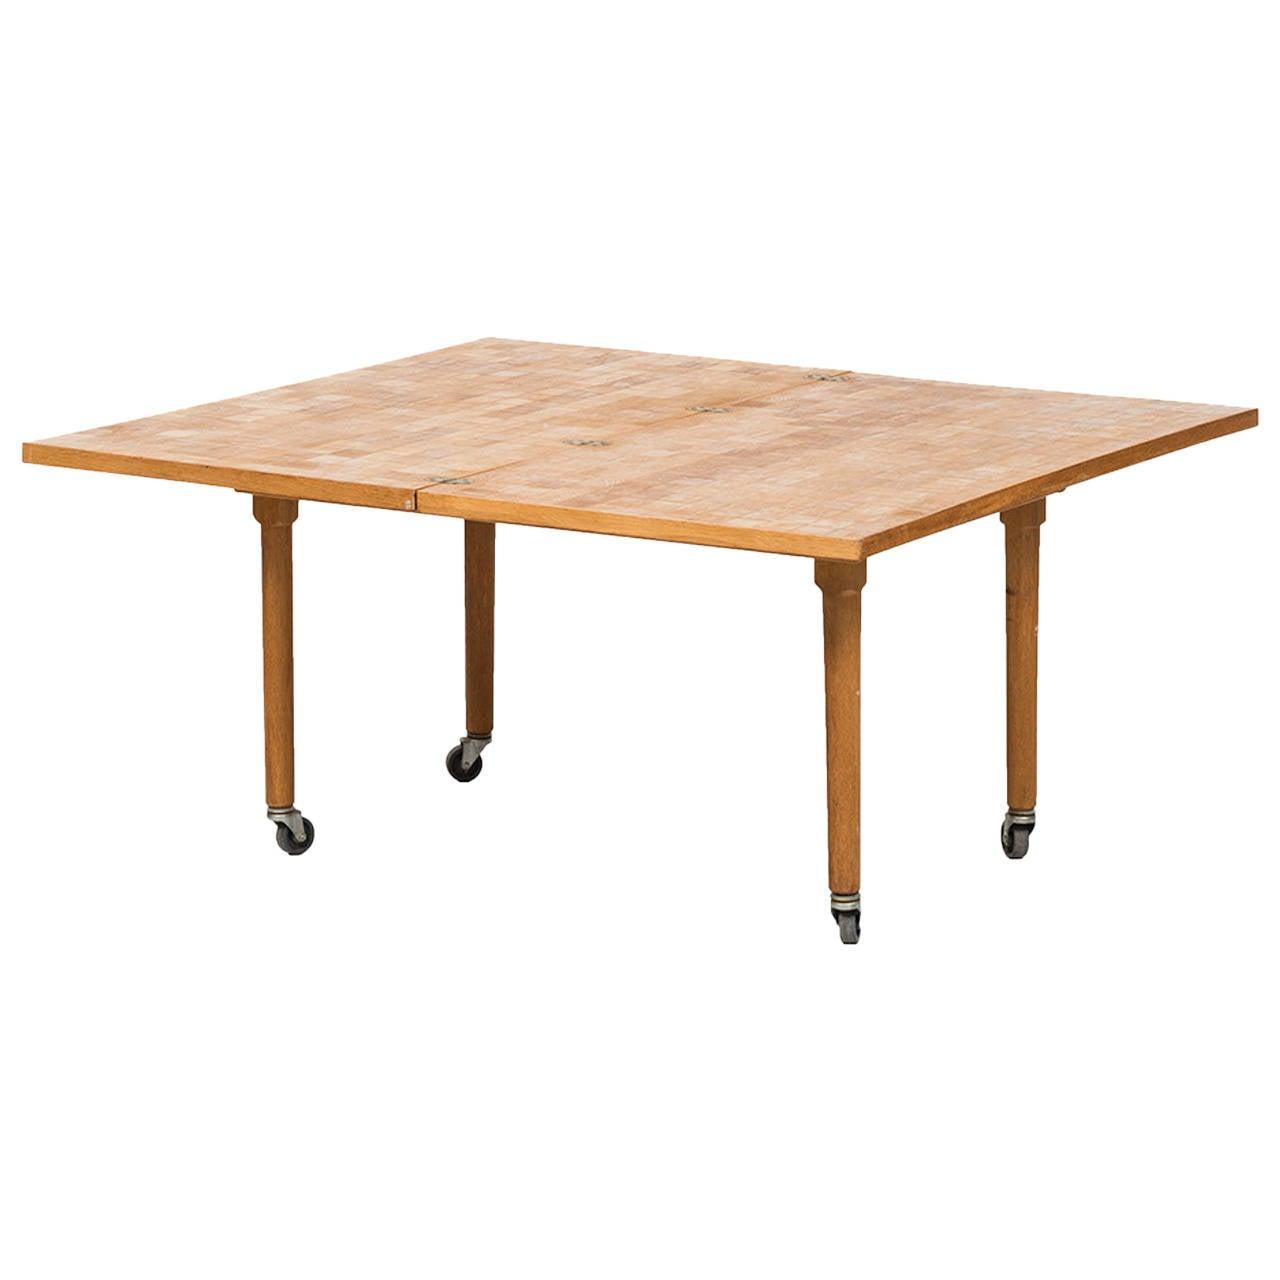 Oak Side Table with Mosaic Pattern